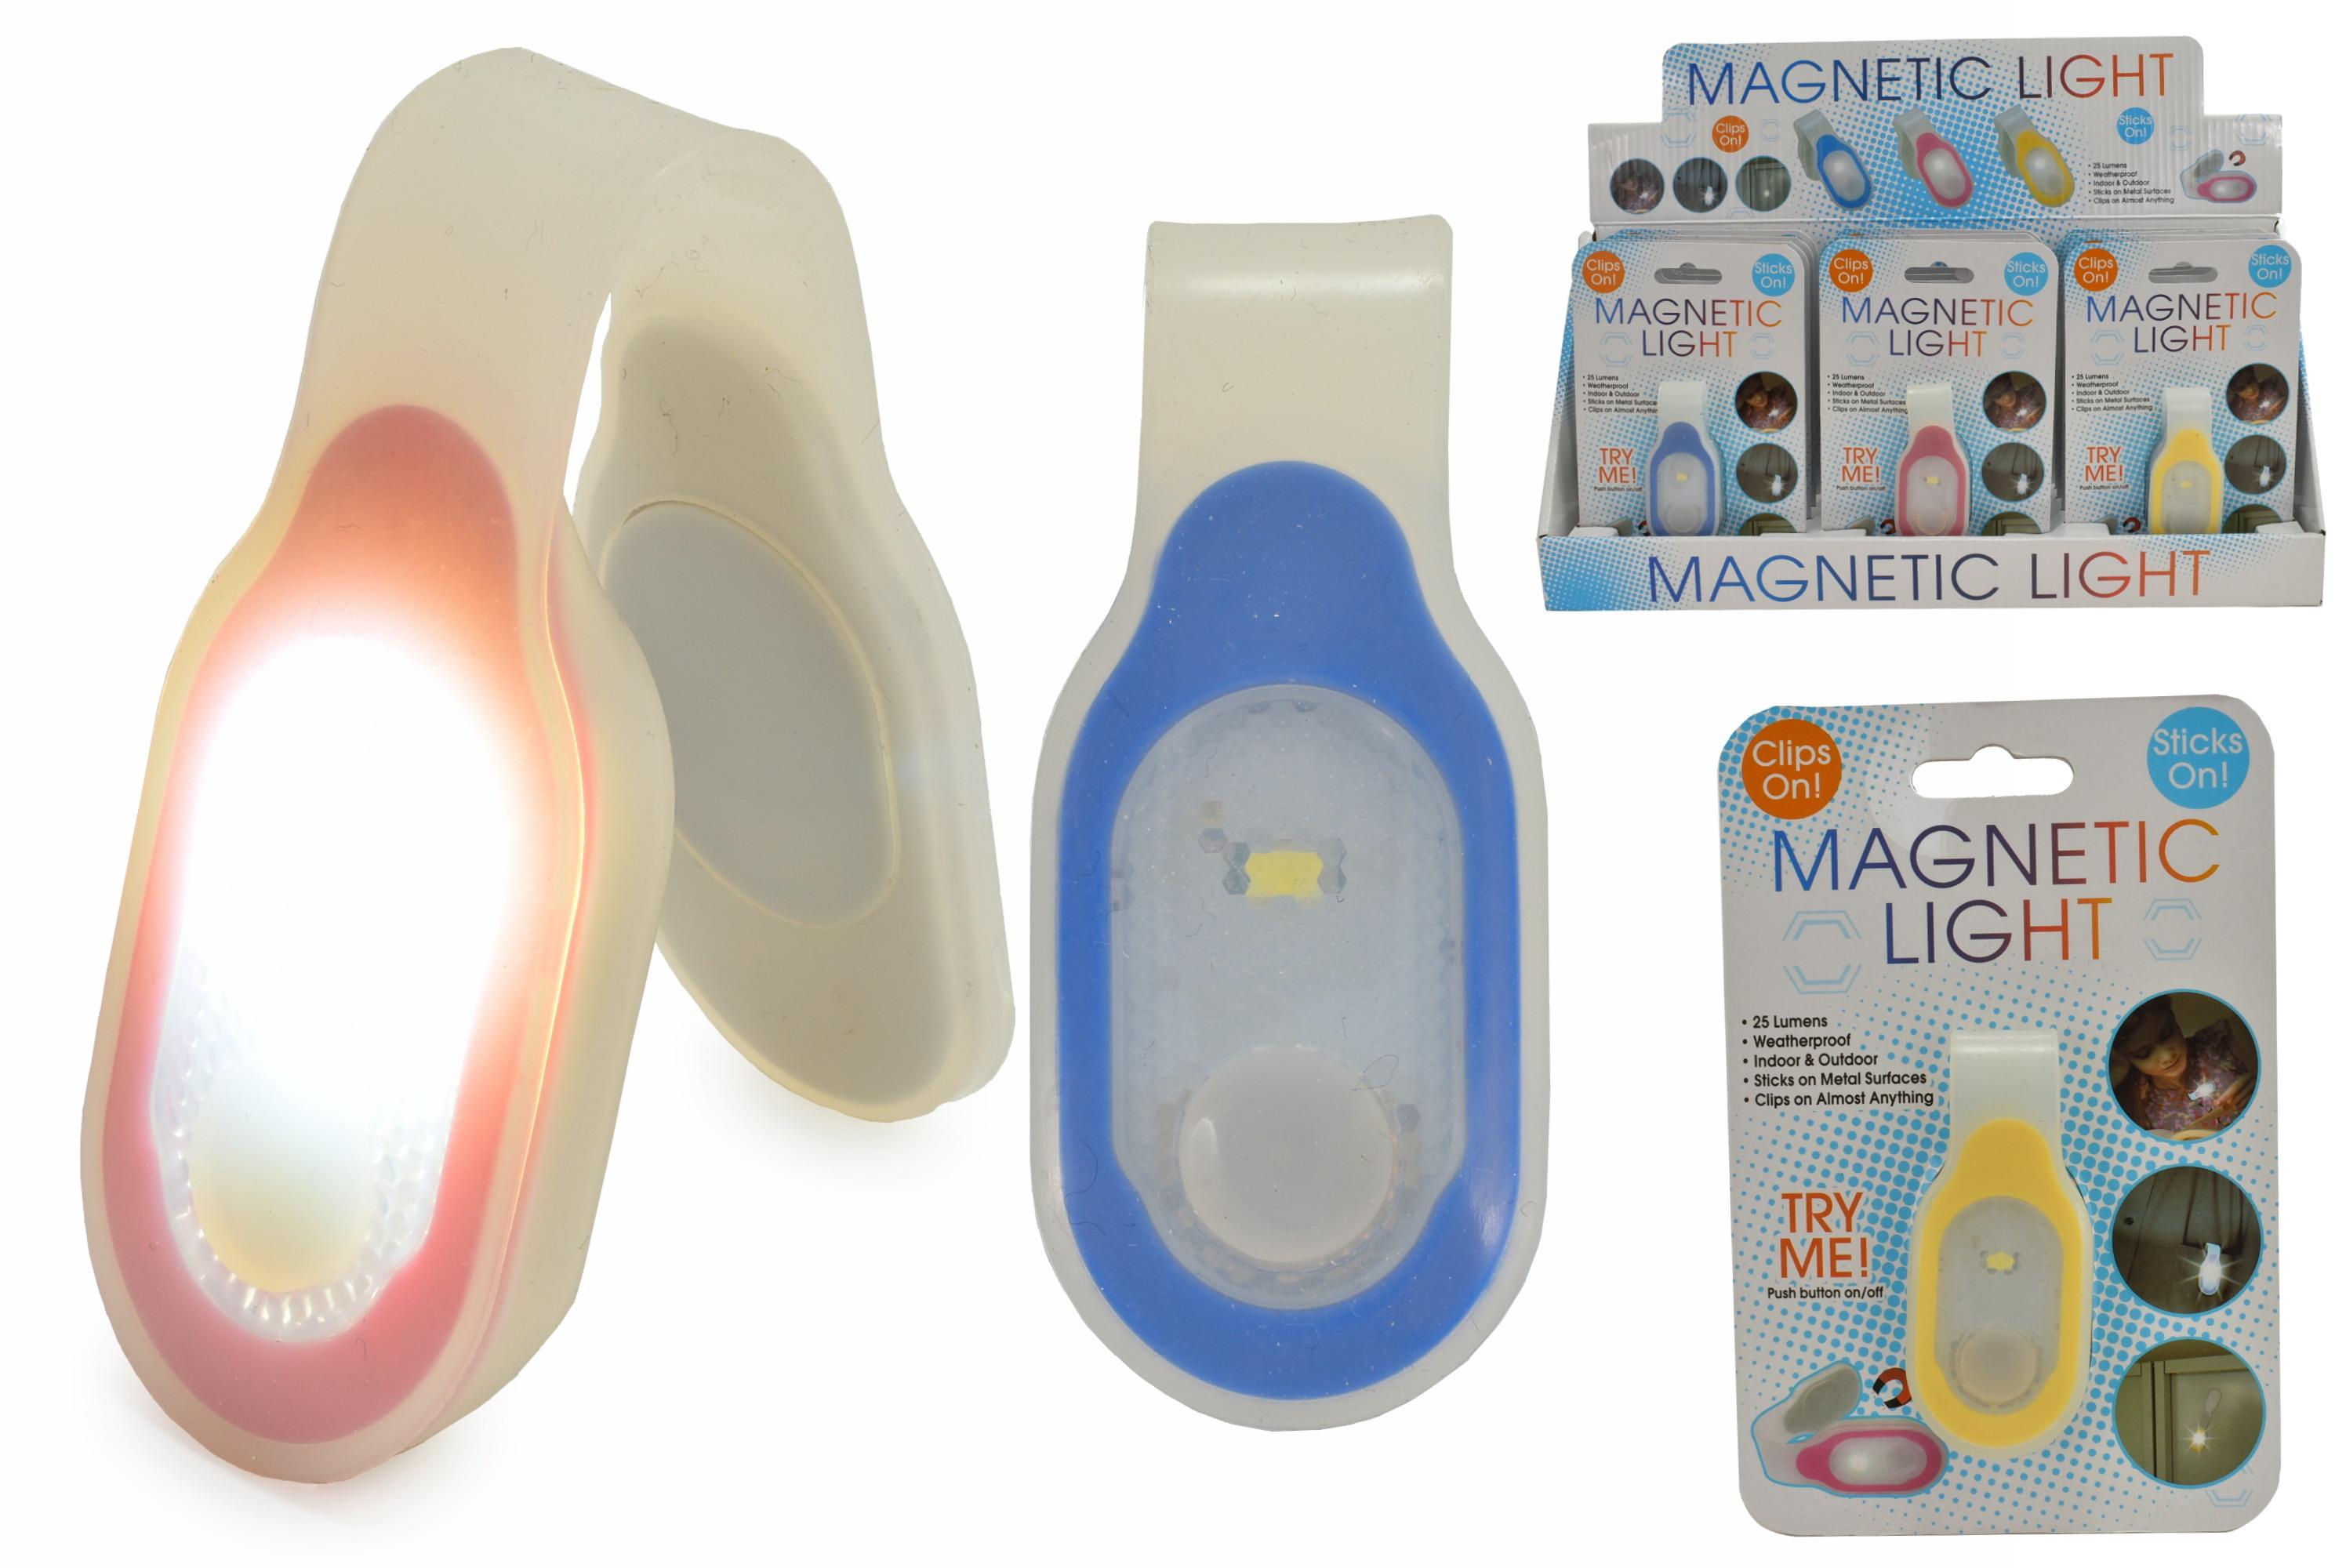 Magnetic Light On Blistercard / Display Box